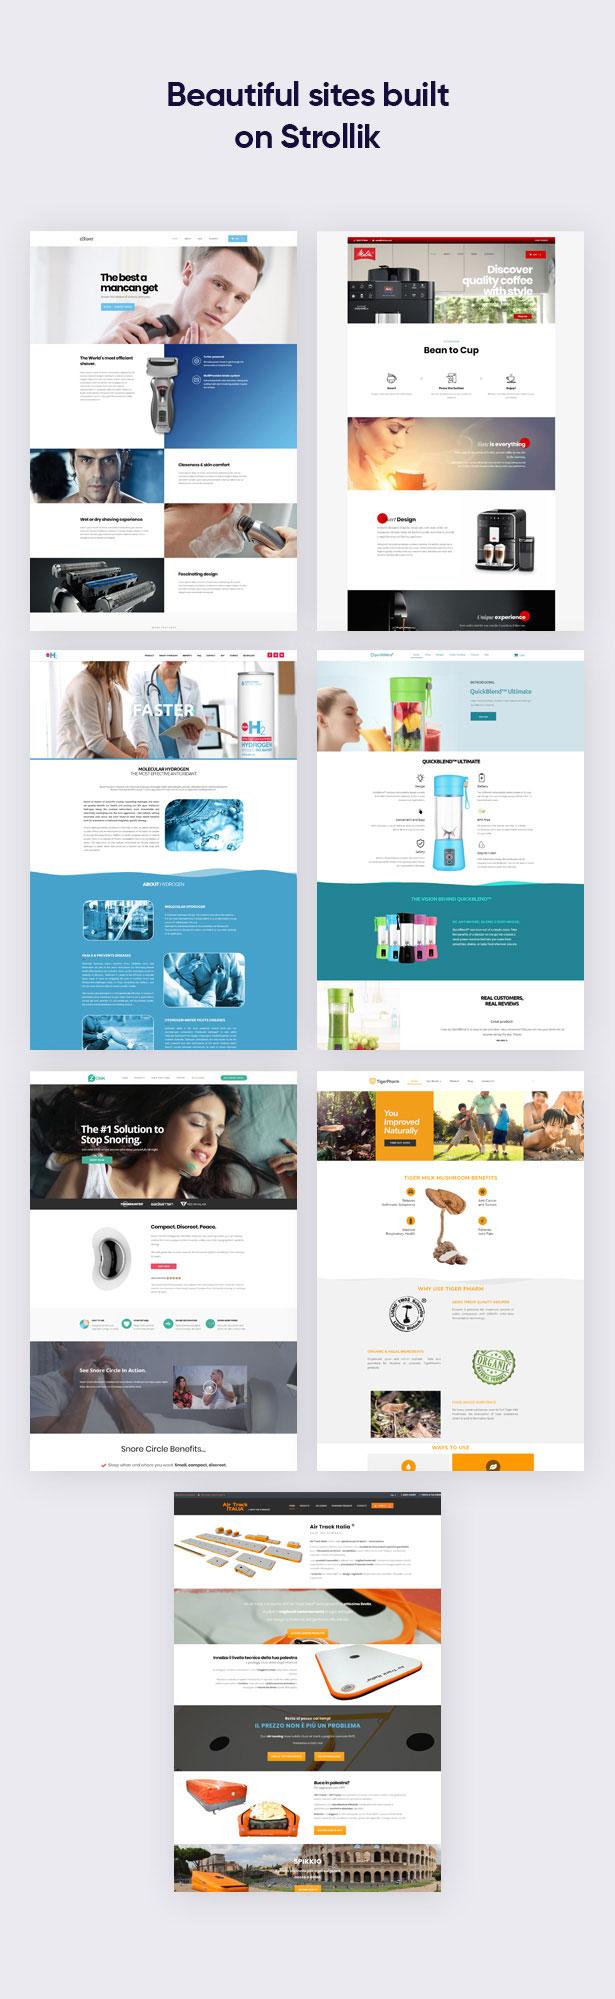 Beautiful sites built on Strollik Single Product WordPress Theme